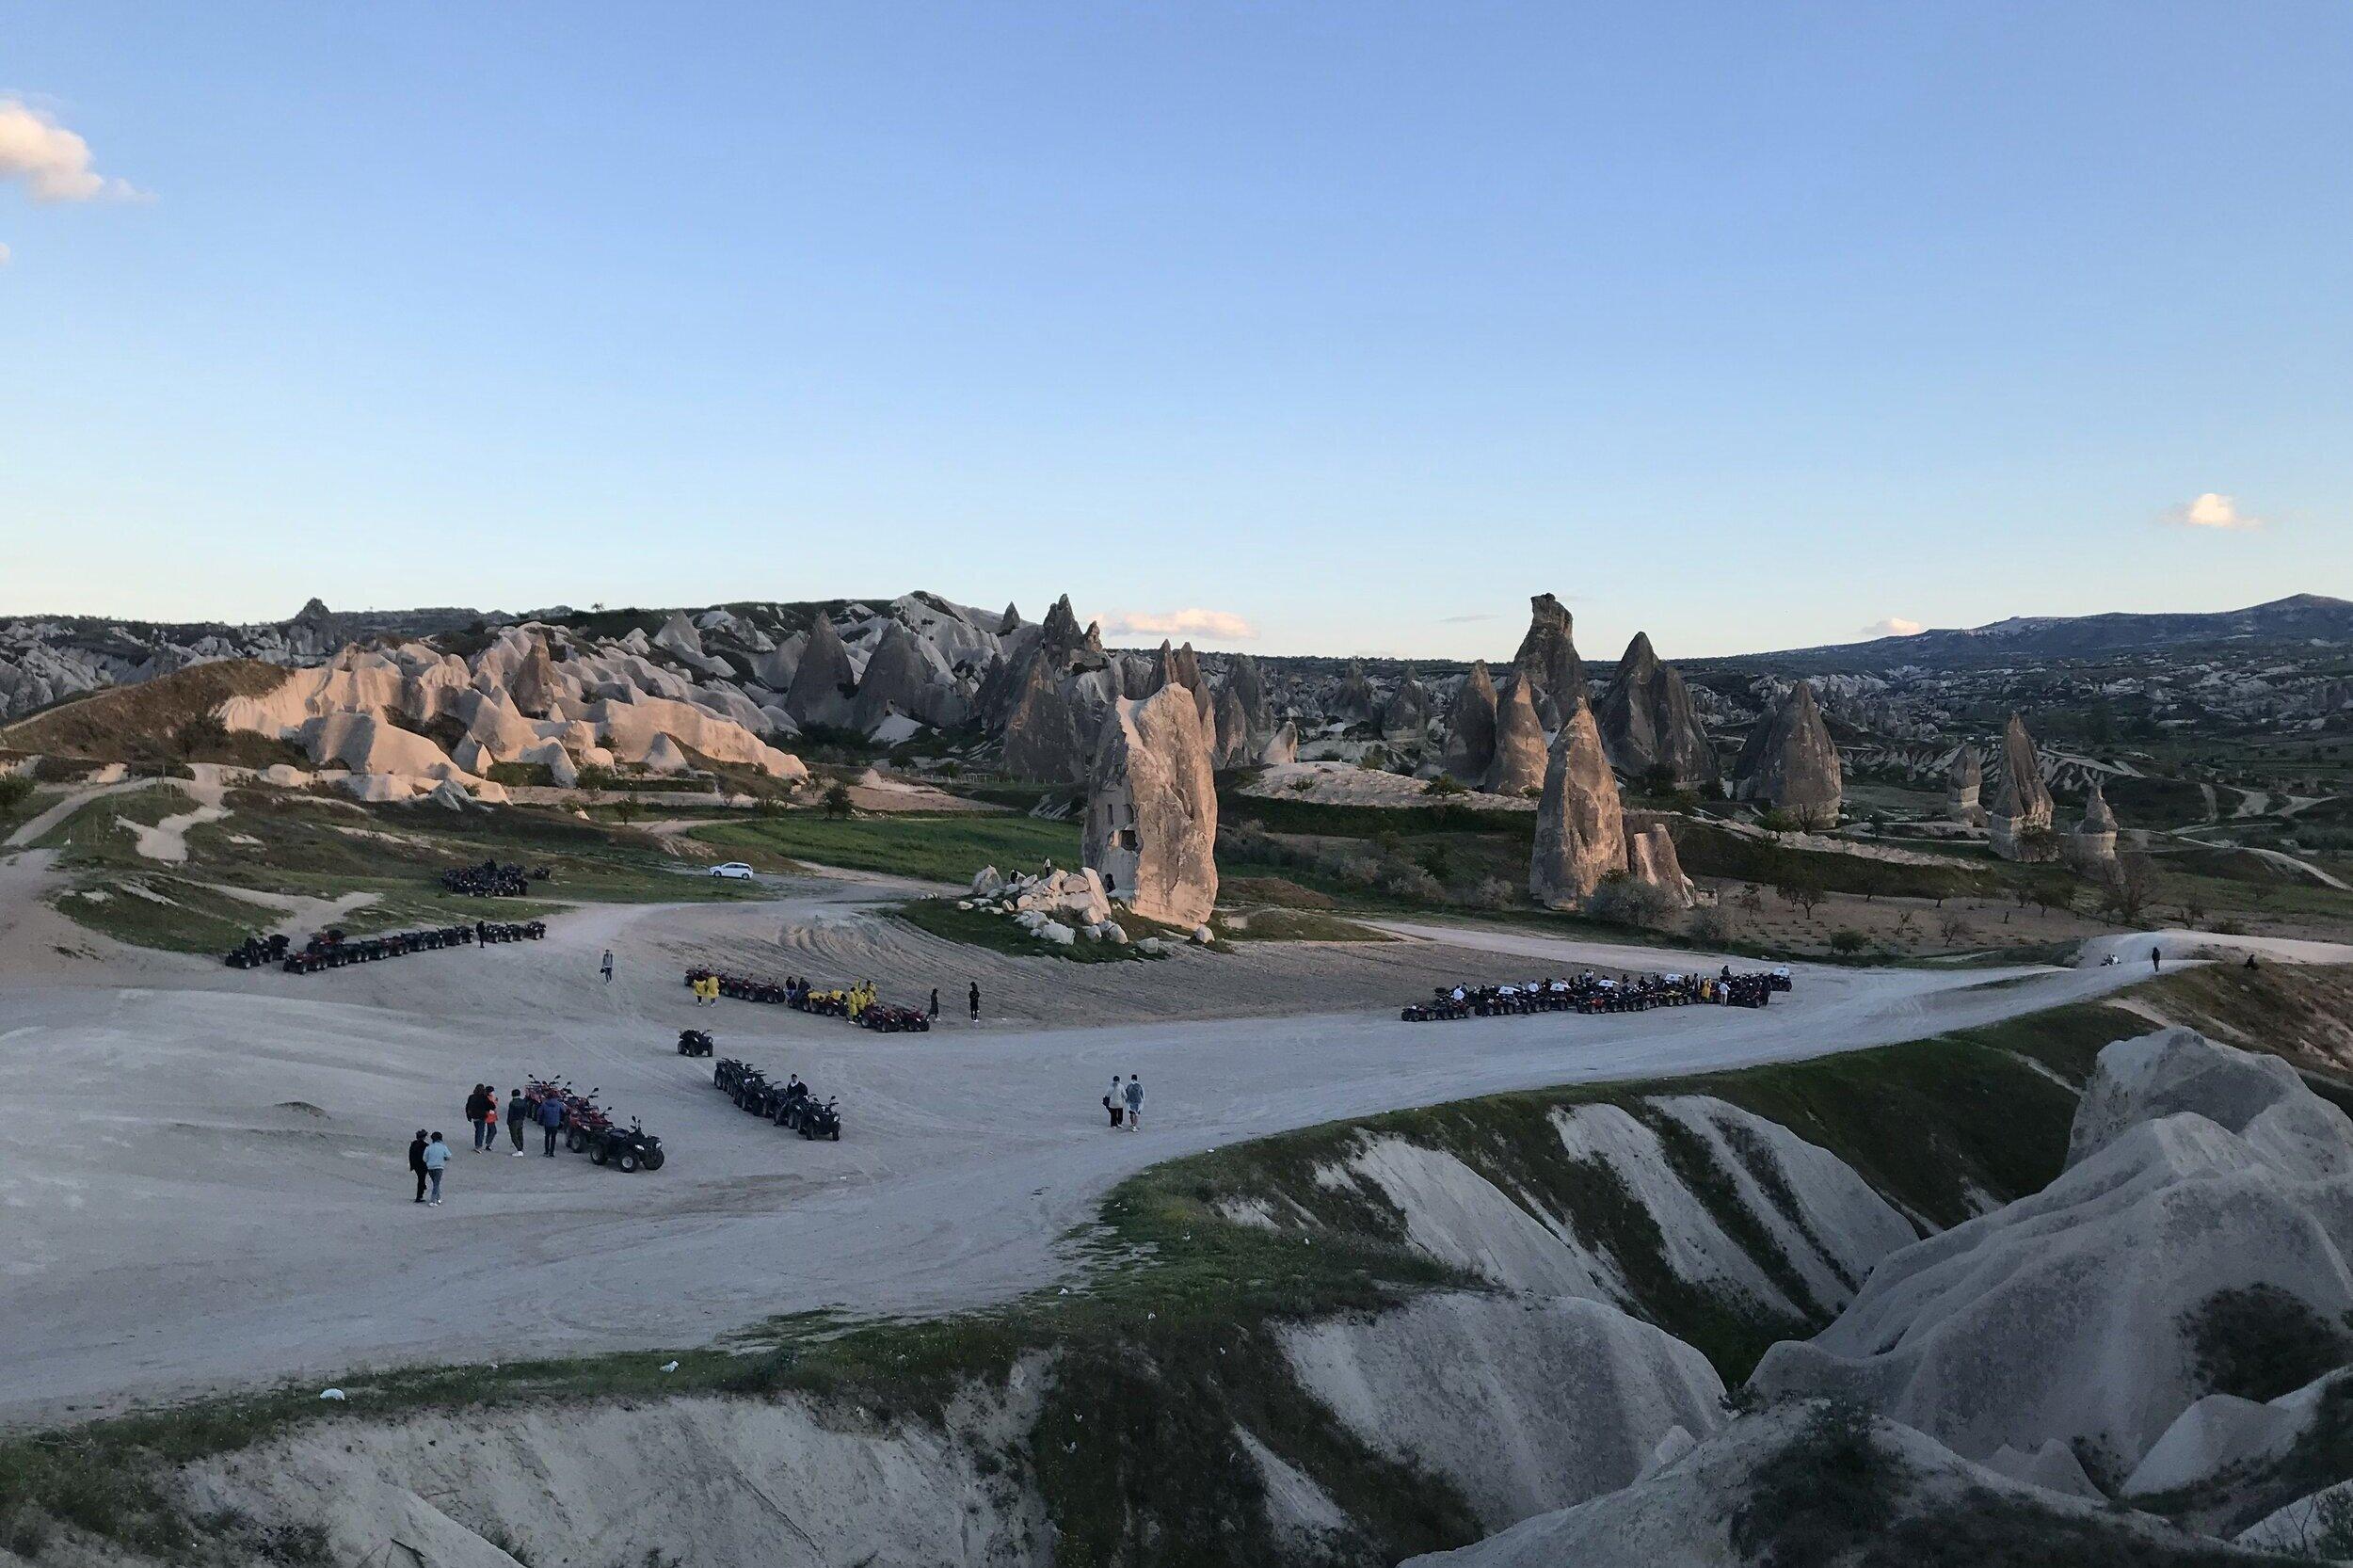 Sunset ATV tour of Göreme National Park